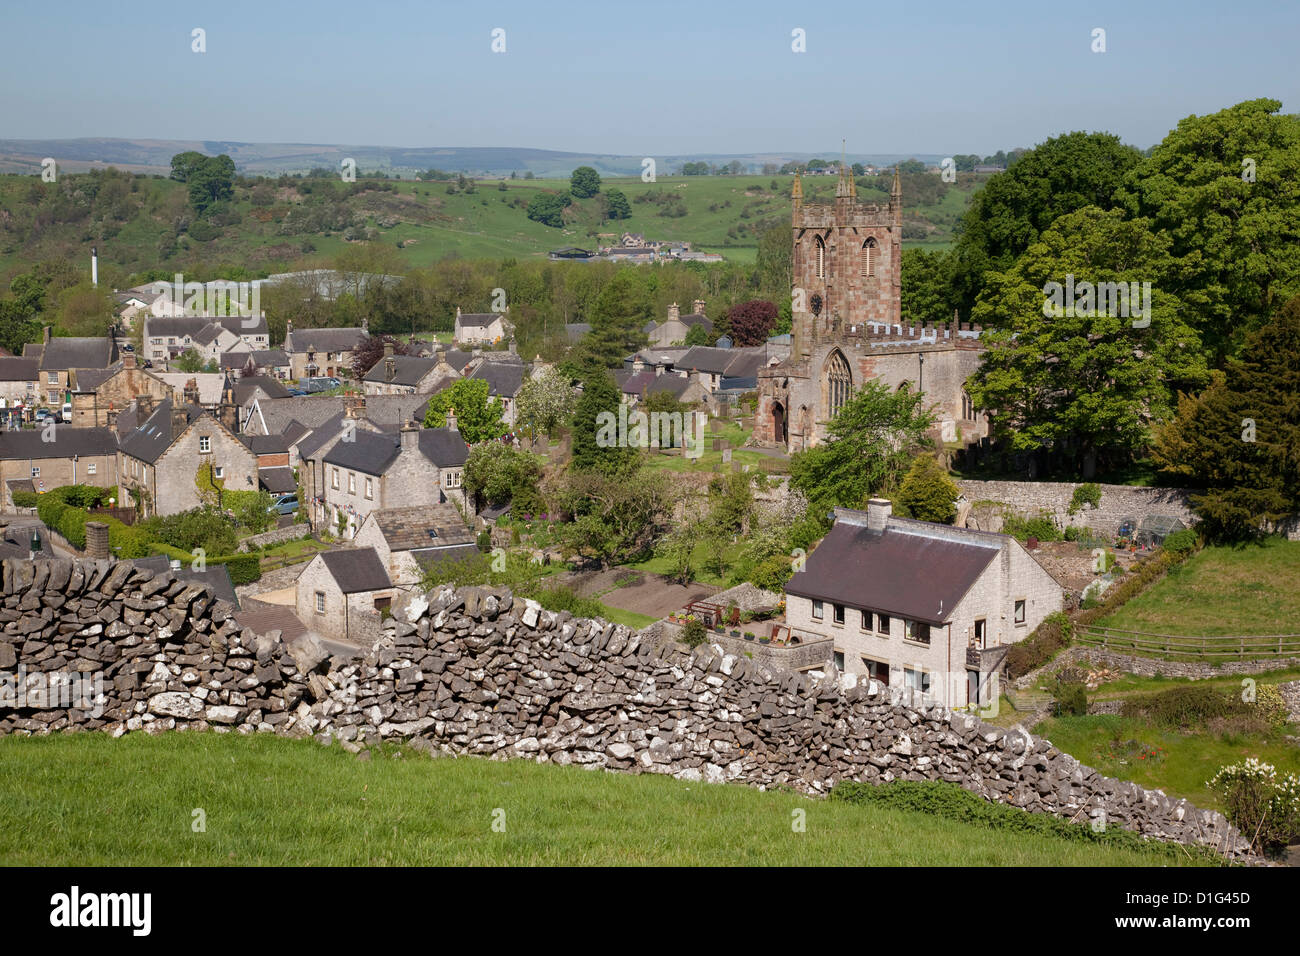 Hartington Pueblo e Iglesia, Peak District, Derbyshire, Inglaterra, Reino Unido, Europa Imagen De Stock